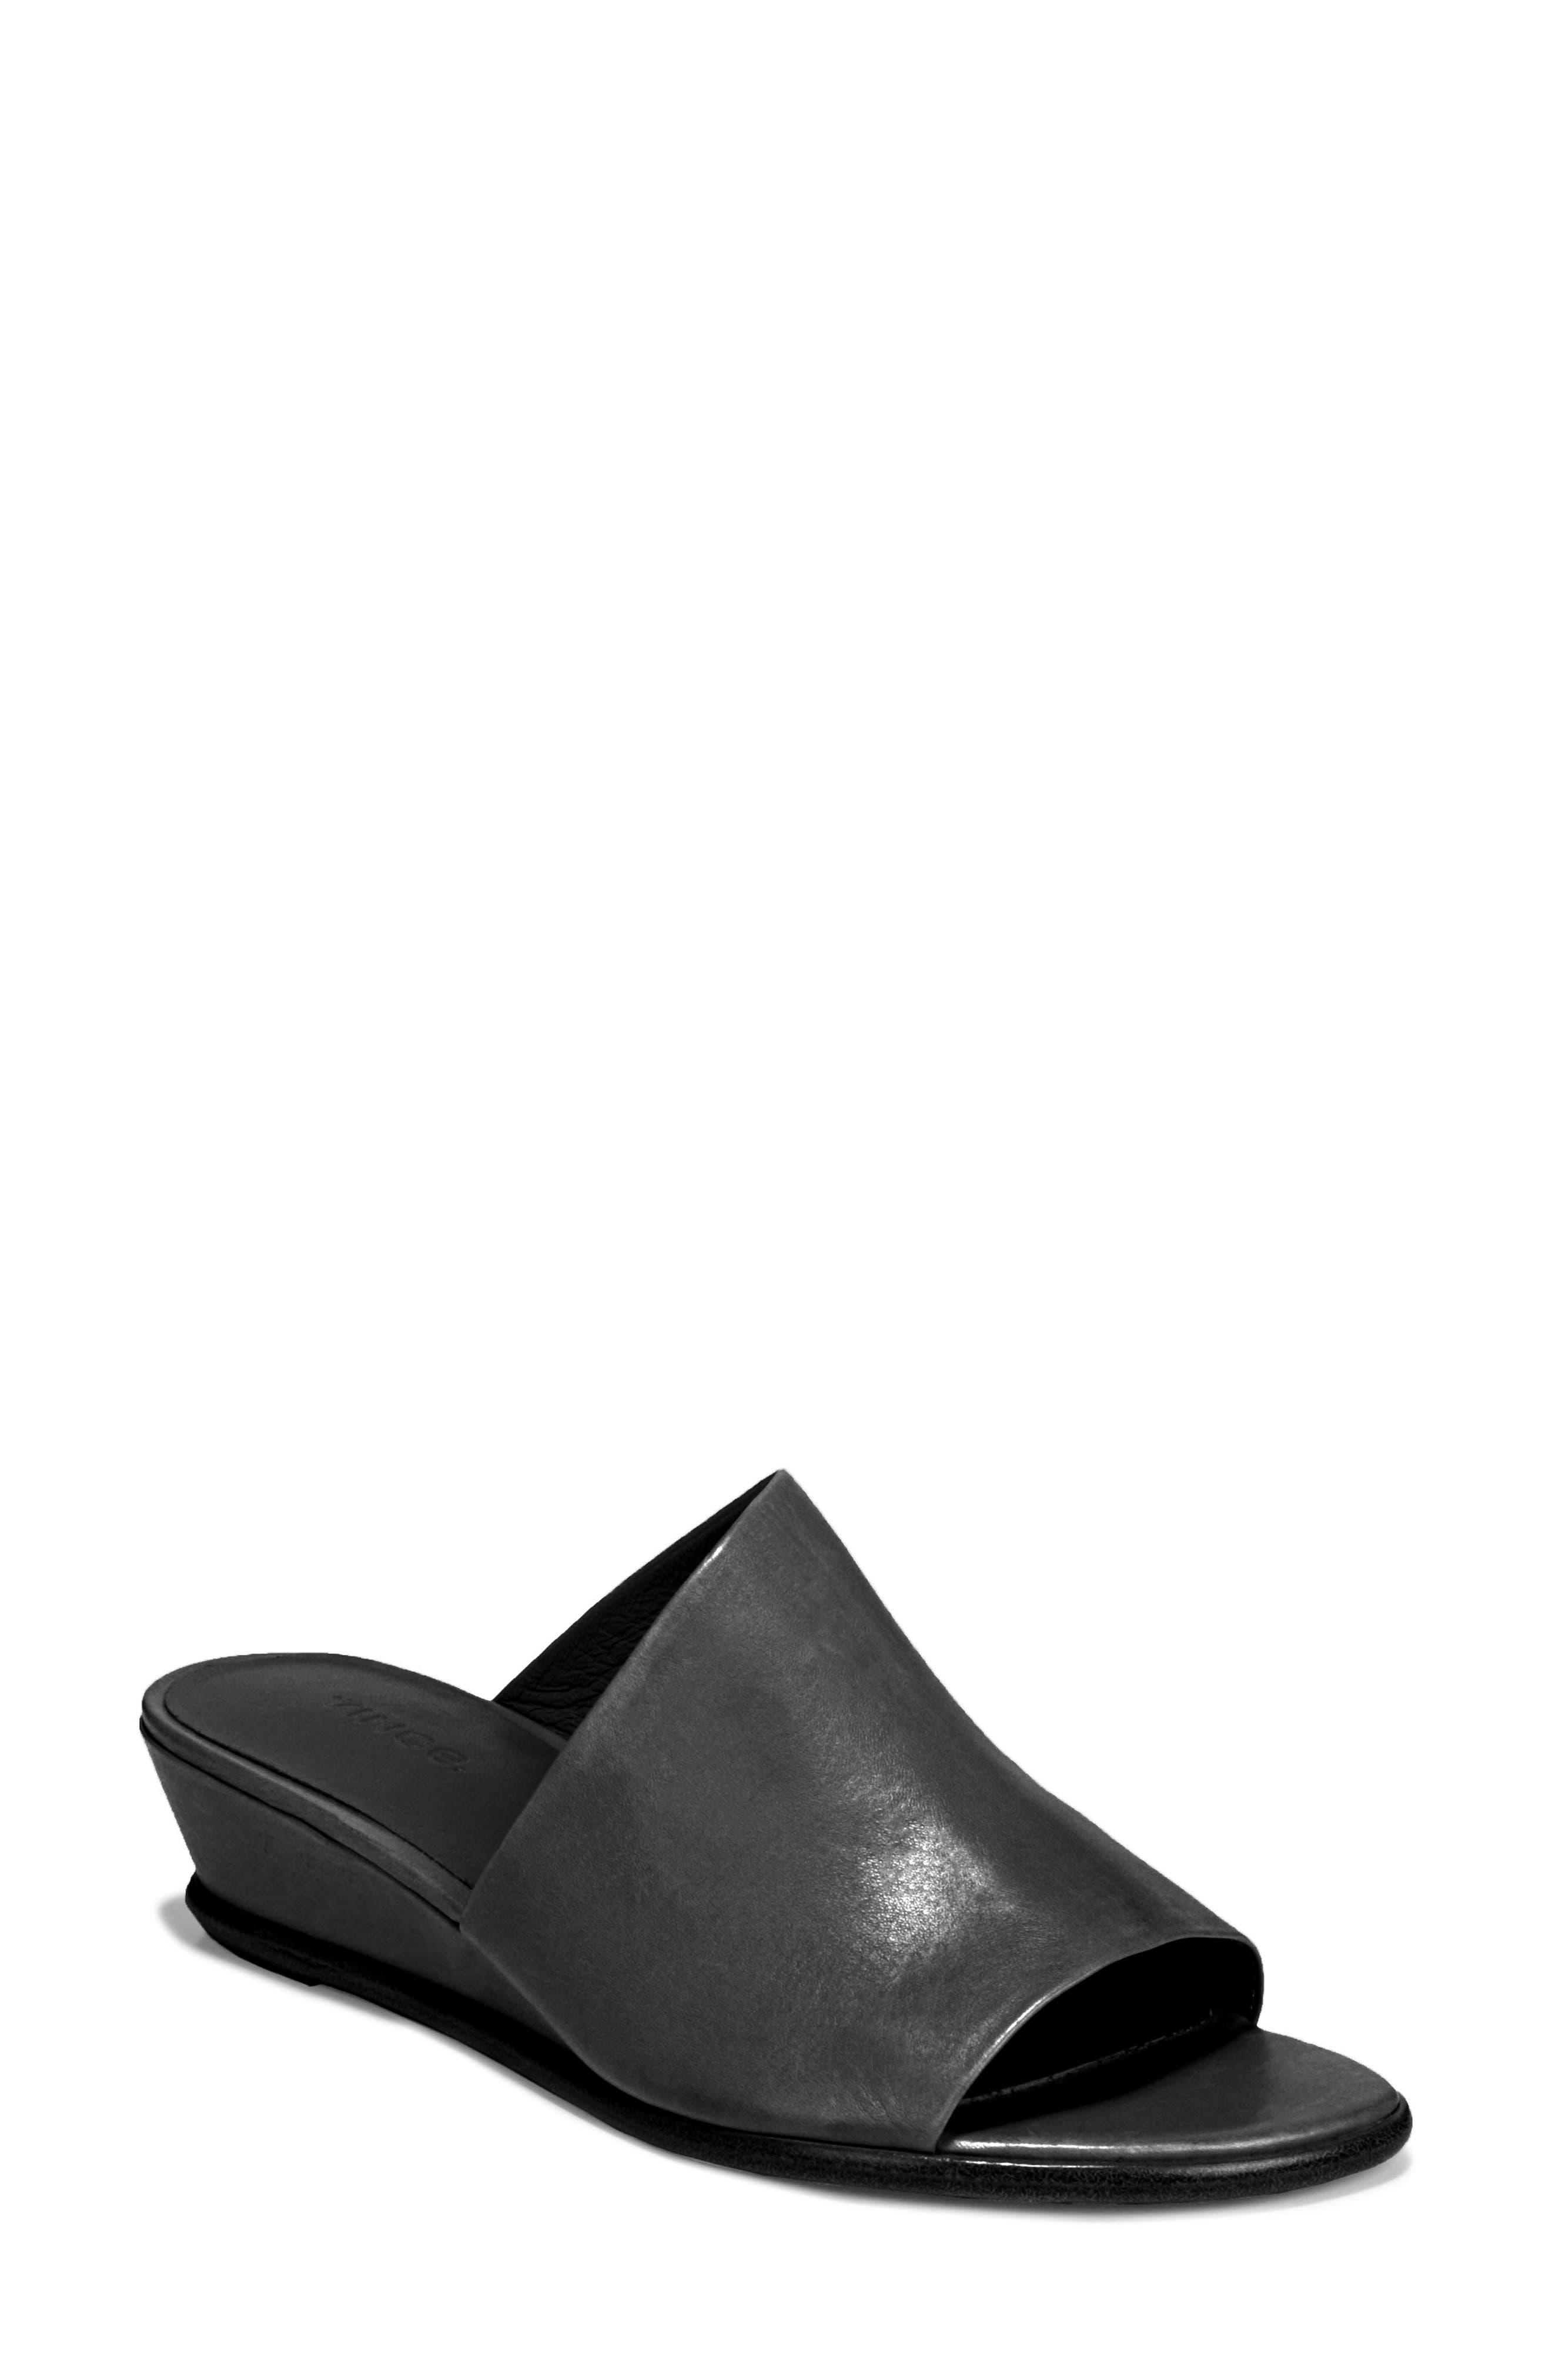 VINCE Duvall Asymmetrical Wedge Sandal, Main, color, BLACK